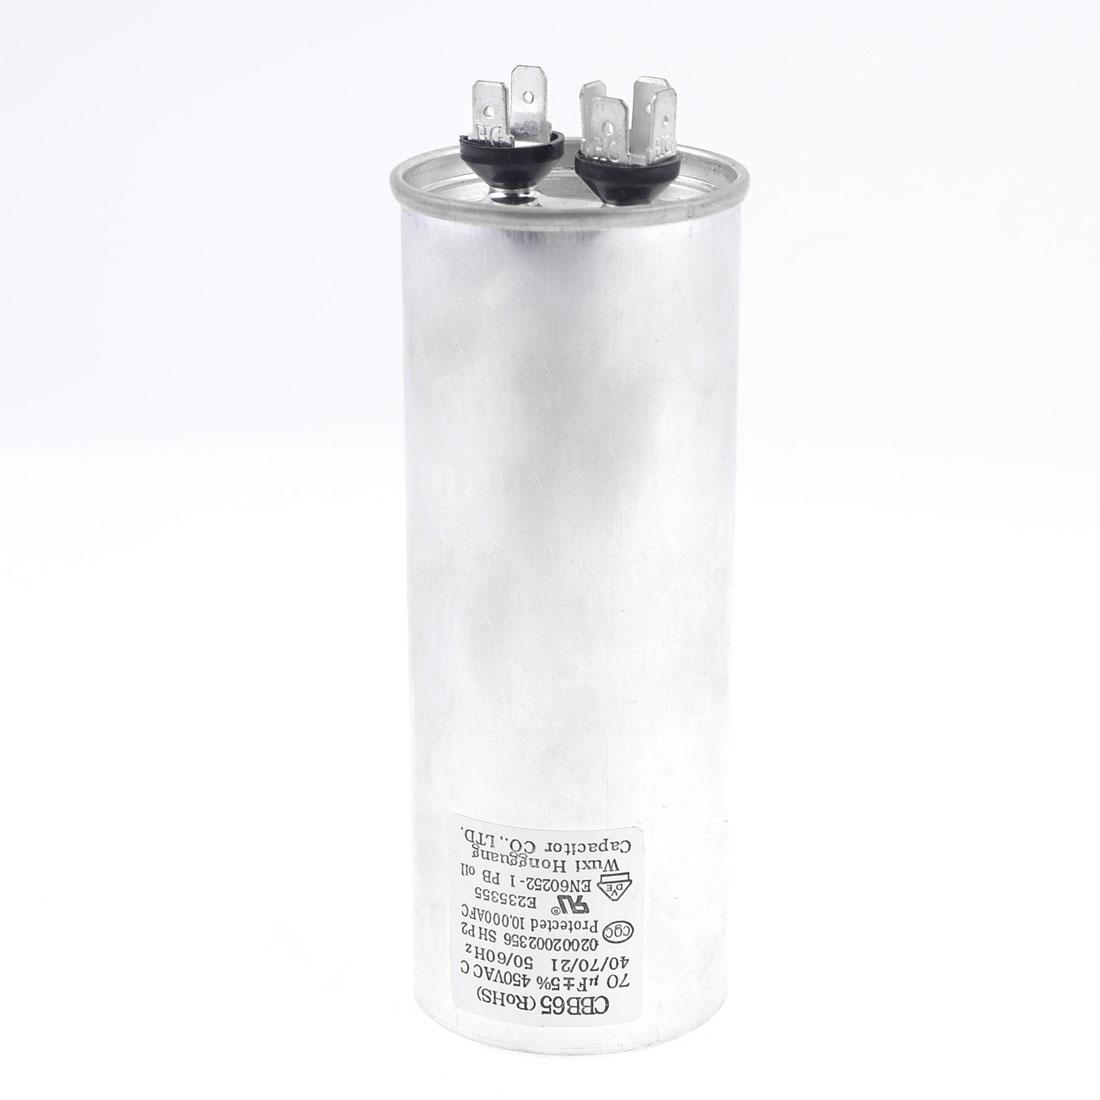 CBB65 Polypropylene Film Lug Terminals Motor Capacitor 450VAC 70uF 5%